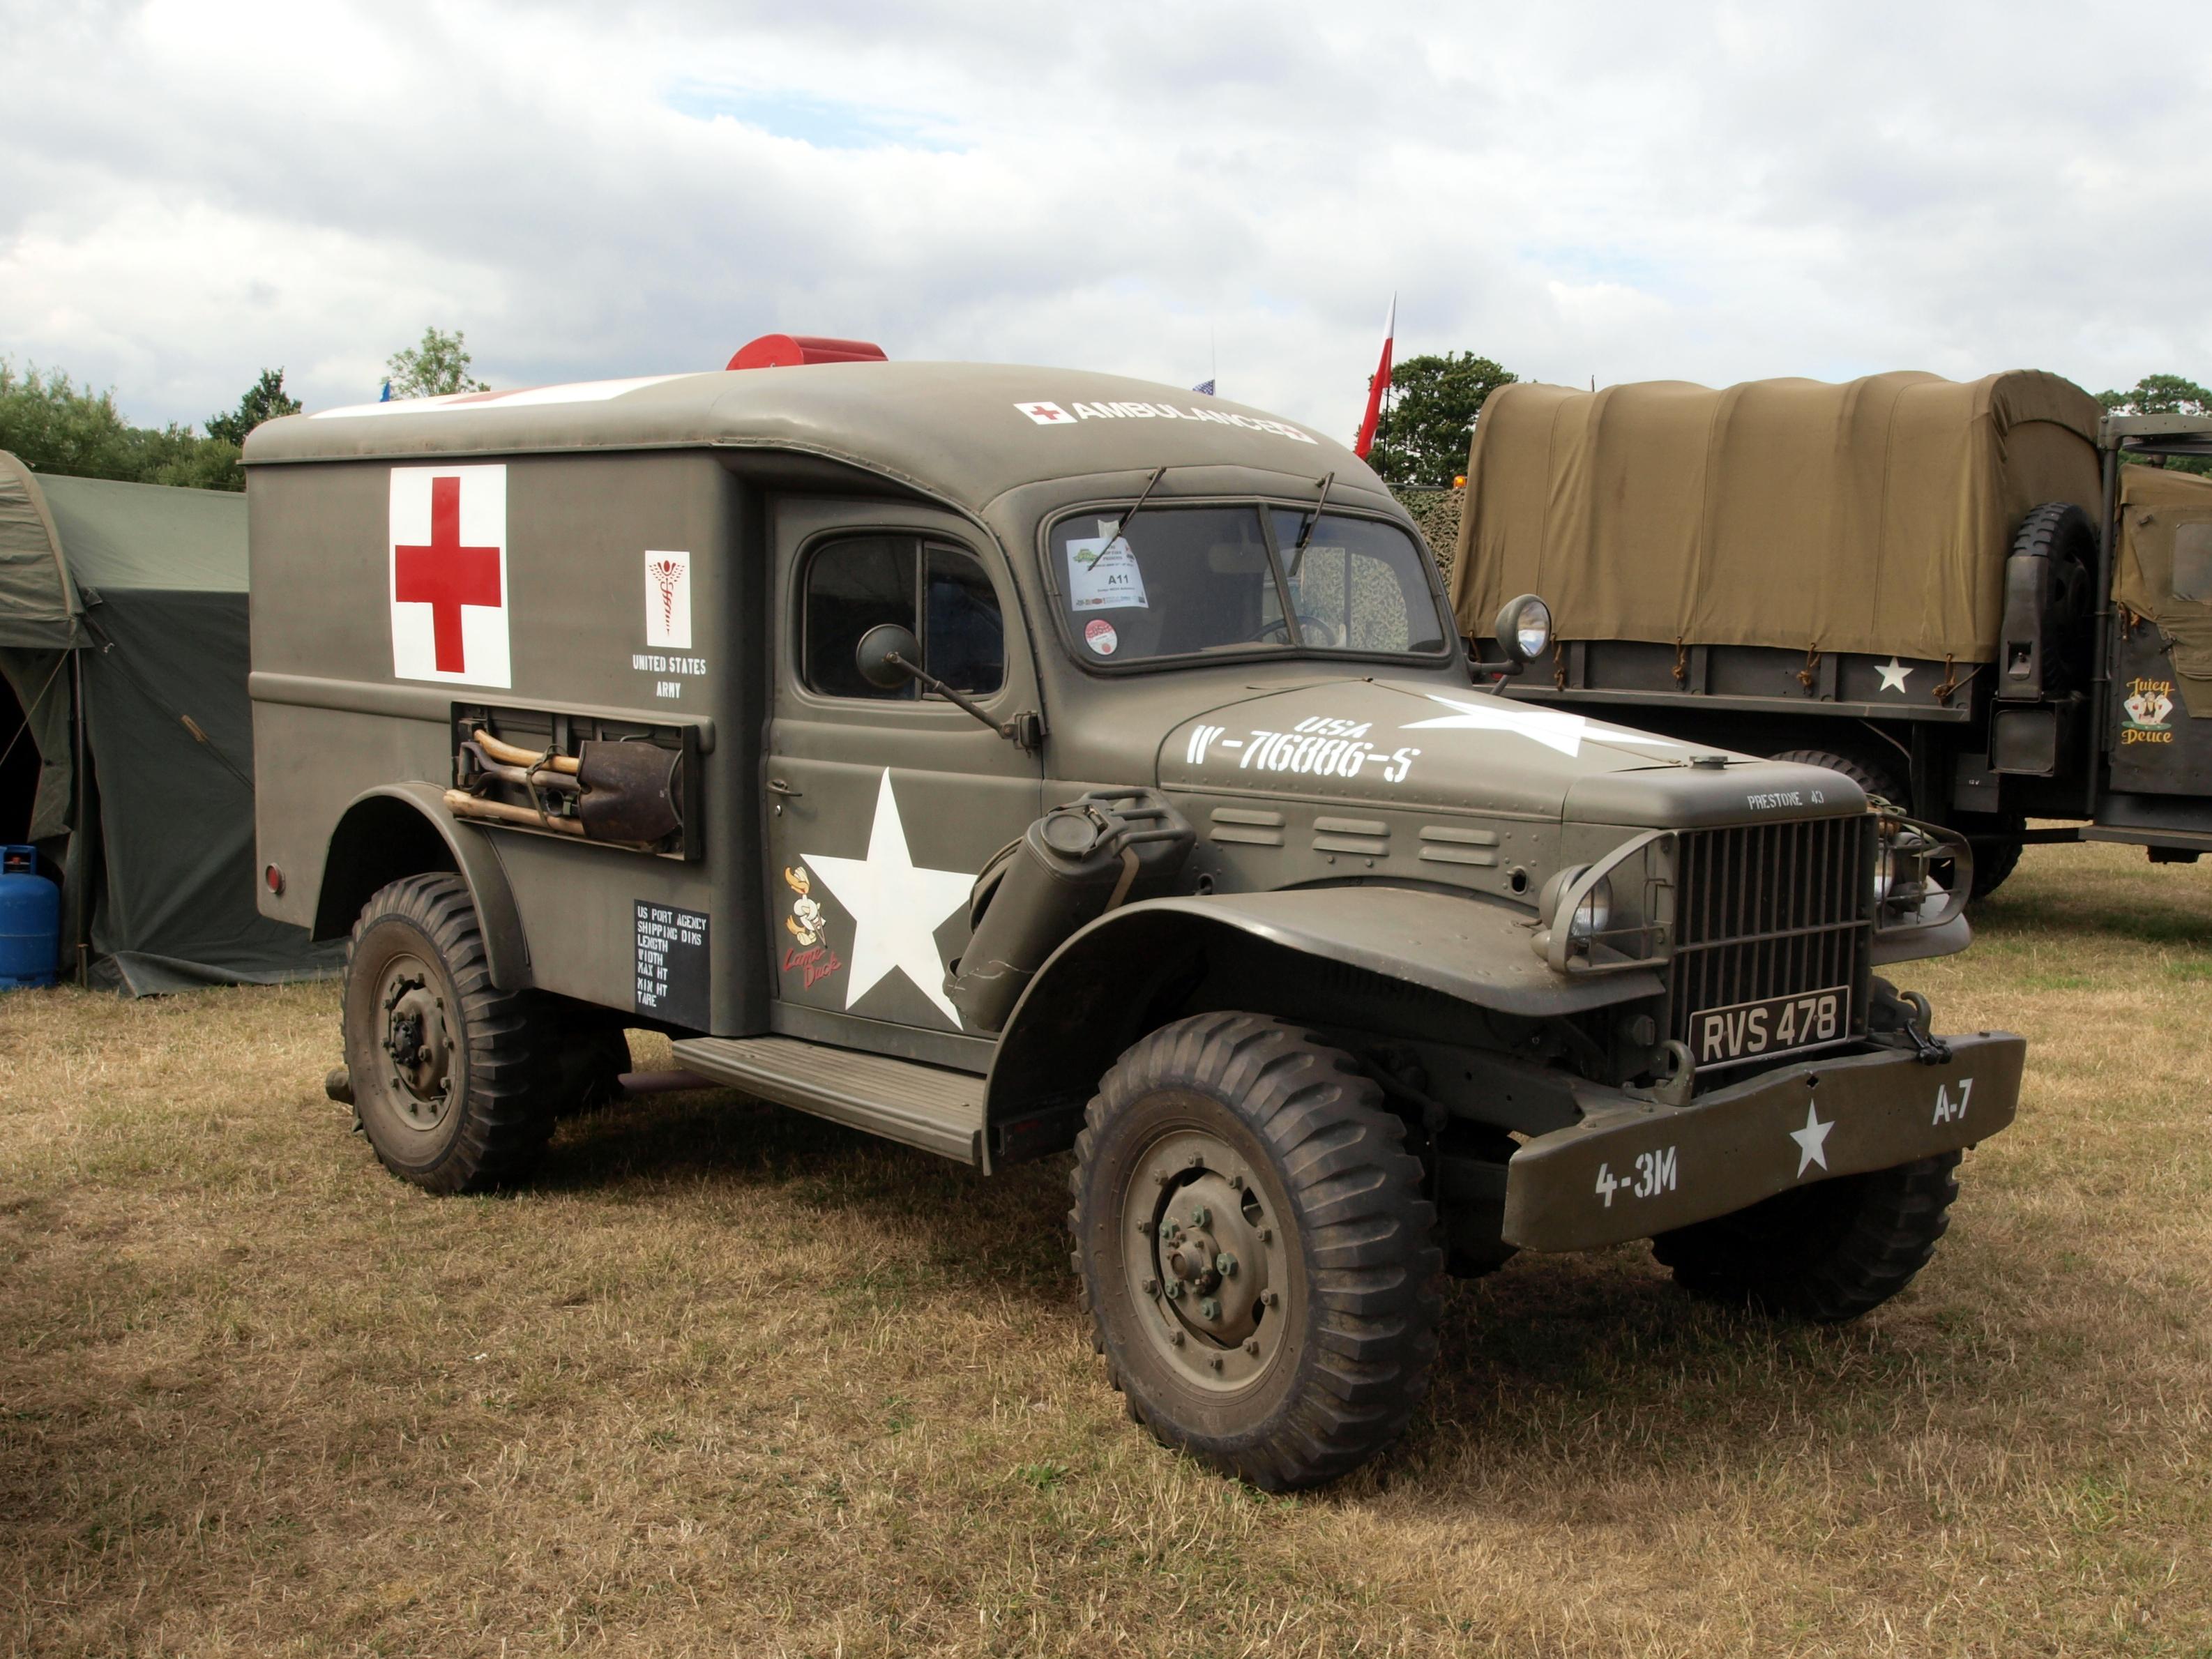 File Dodge Wc 54 Military Ambulance G 502 4x4 W 716886 S